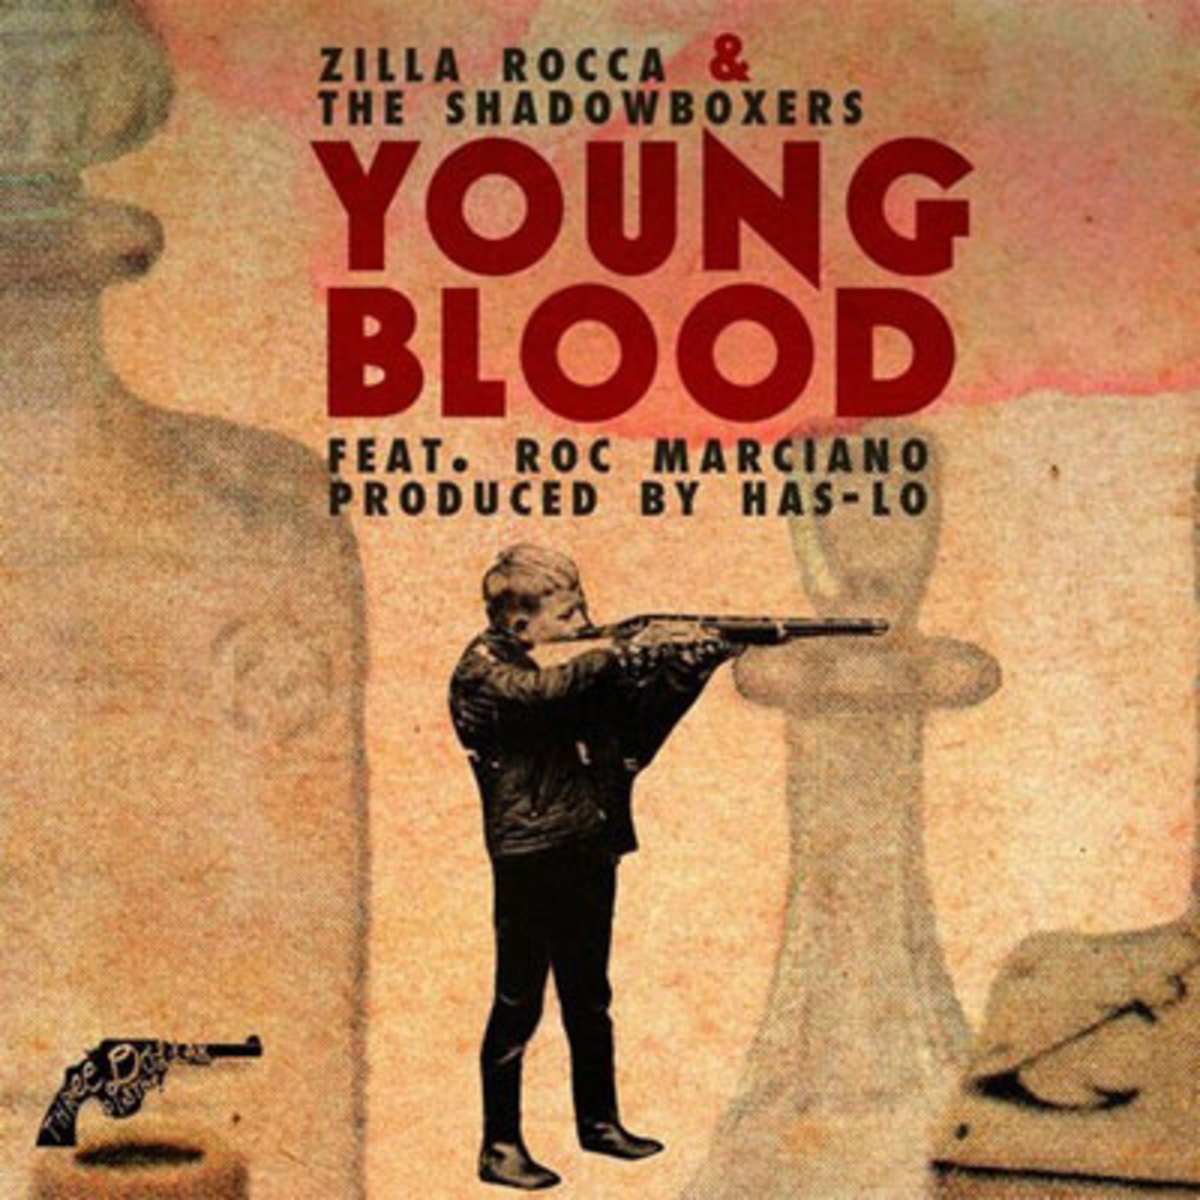 zillarocca-youngblood.jpg